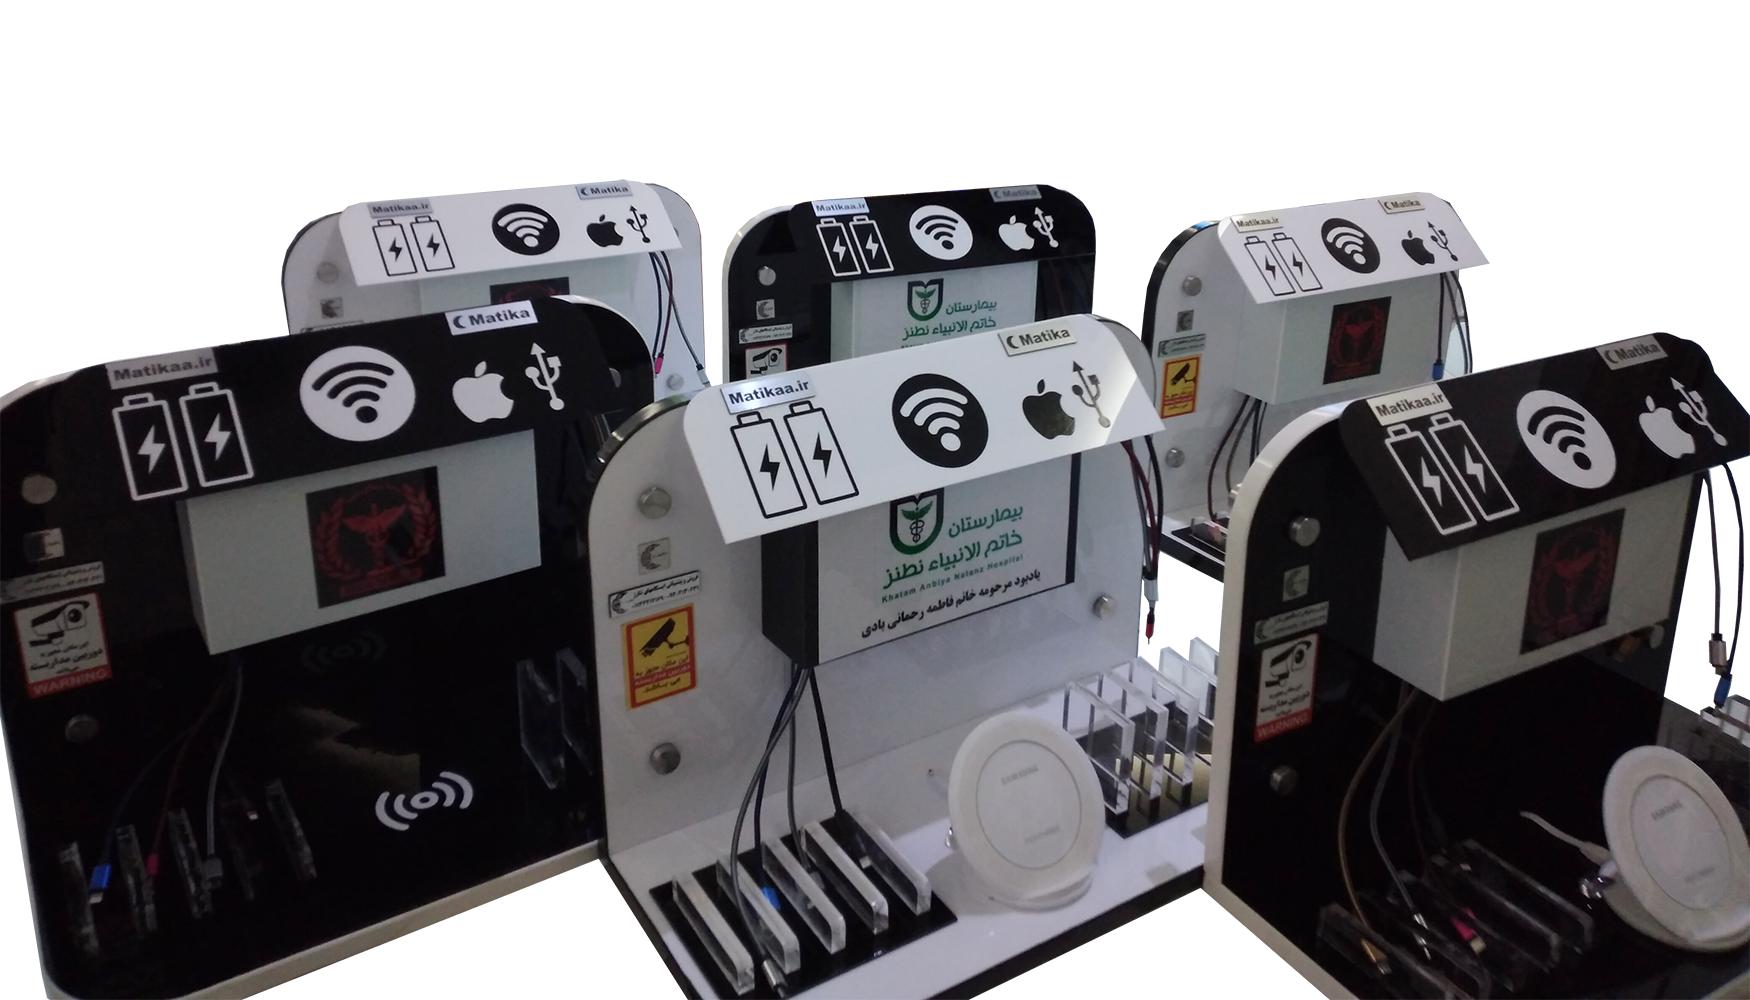 شارژر – شارژ موبایل – استند شارژر موبایل – استند شارژر اماکن عمومی – استند شارژ موبایل - استند شارژ - ایستگاه شارژ موبایل - شارژر موبایل - شارژر اماکن عمومی - شارژرهای عمومی - شارژر موبایل اماکن عمومی - شارژر وایرلس - شارژر بی سیم – ایستگاه شارژ - شارژرهای فست - شارژر رومیزی – استند موبایل –  – شارژر عمومی – تابلو اعلانات – تابلو اطلاعات هوشمند – شارژر چندتایی – تابلو اطلاع رسانی – شارژرها -